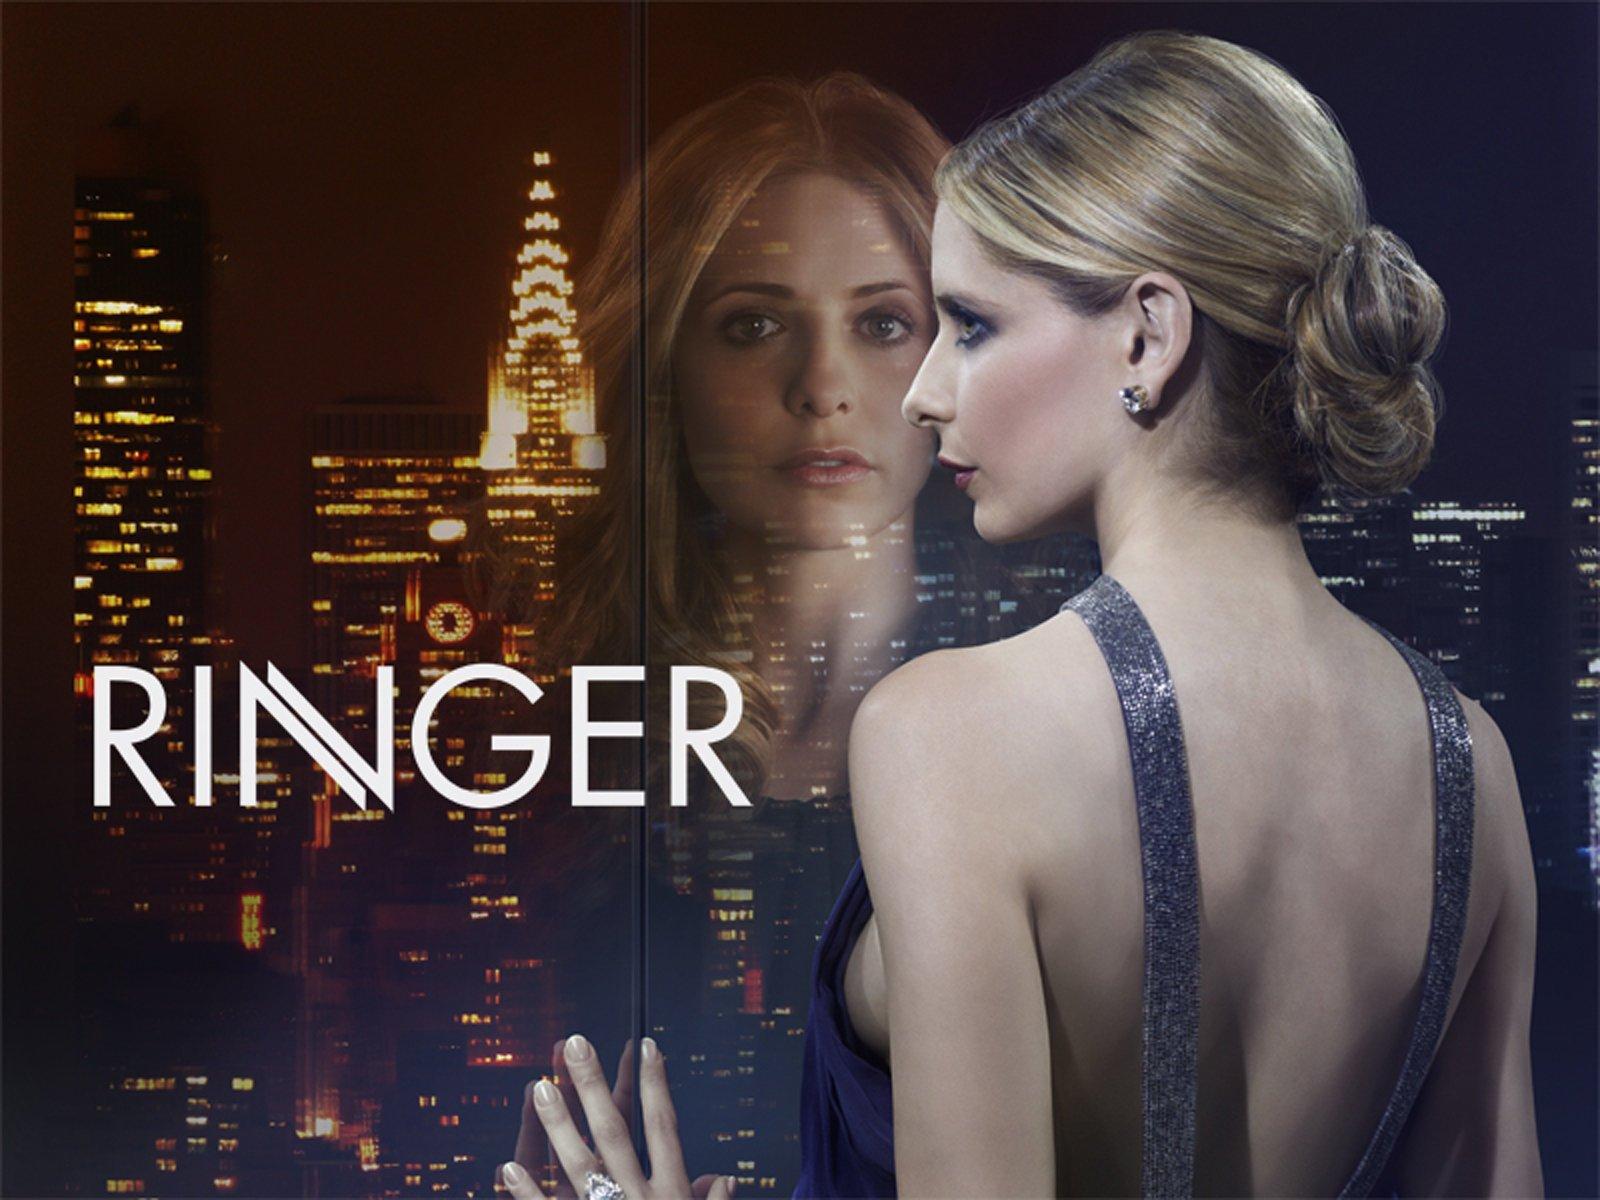 Watch ringer season 1 episode 22 online dating